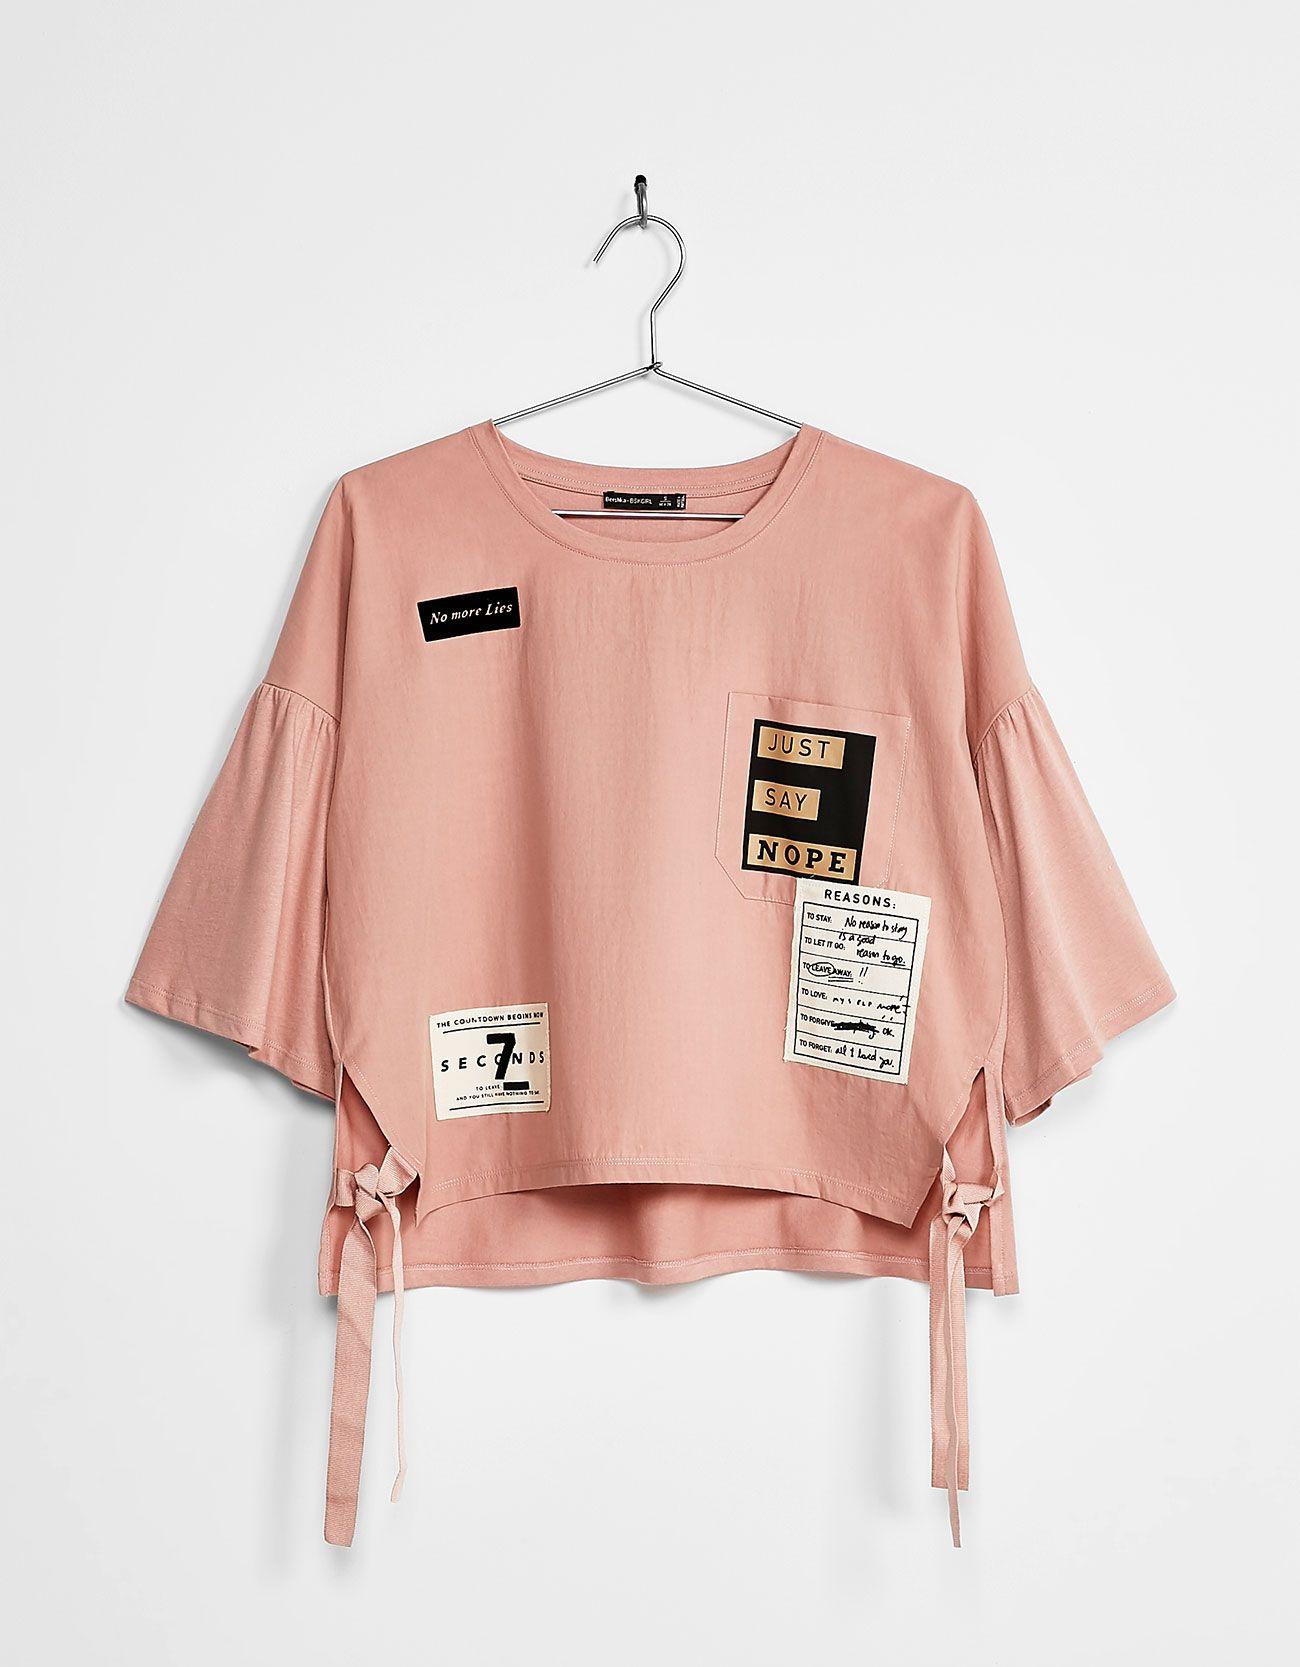 49f06e0911b4 Camiseta manga campana parches | Busos para dama | Ropa coreana ...